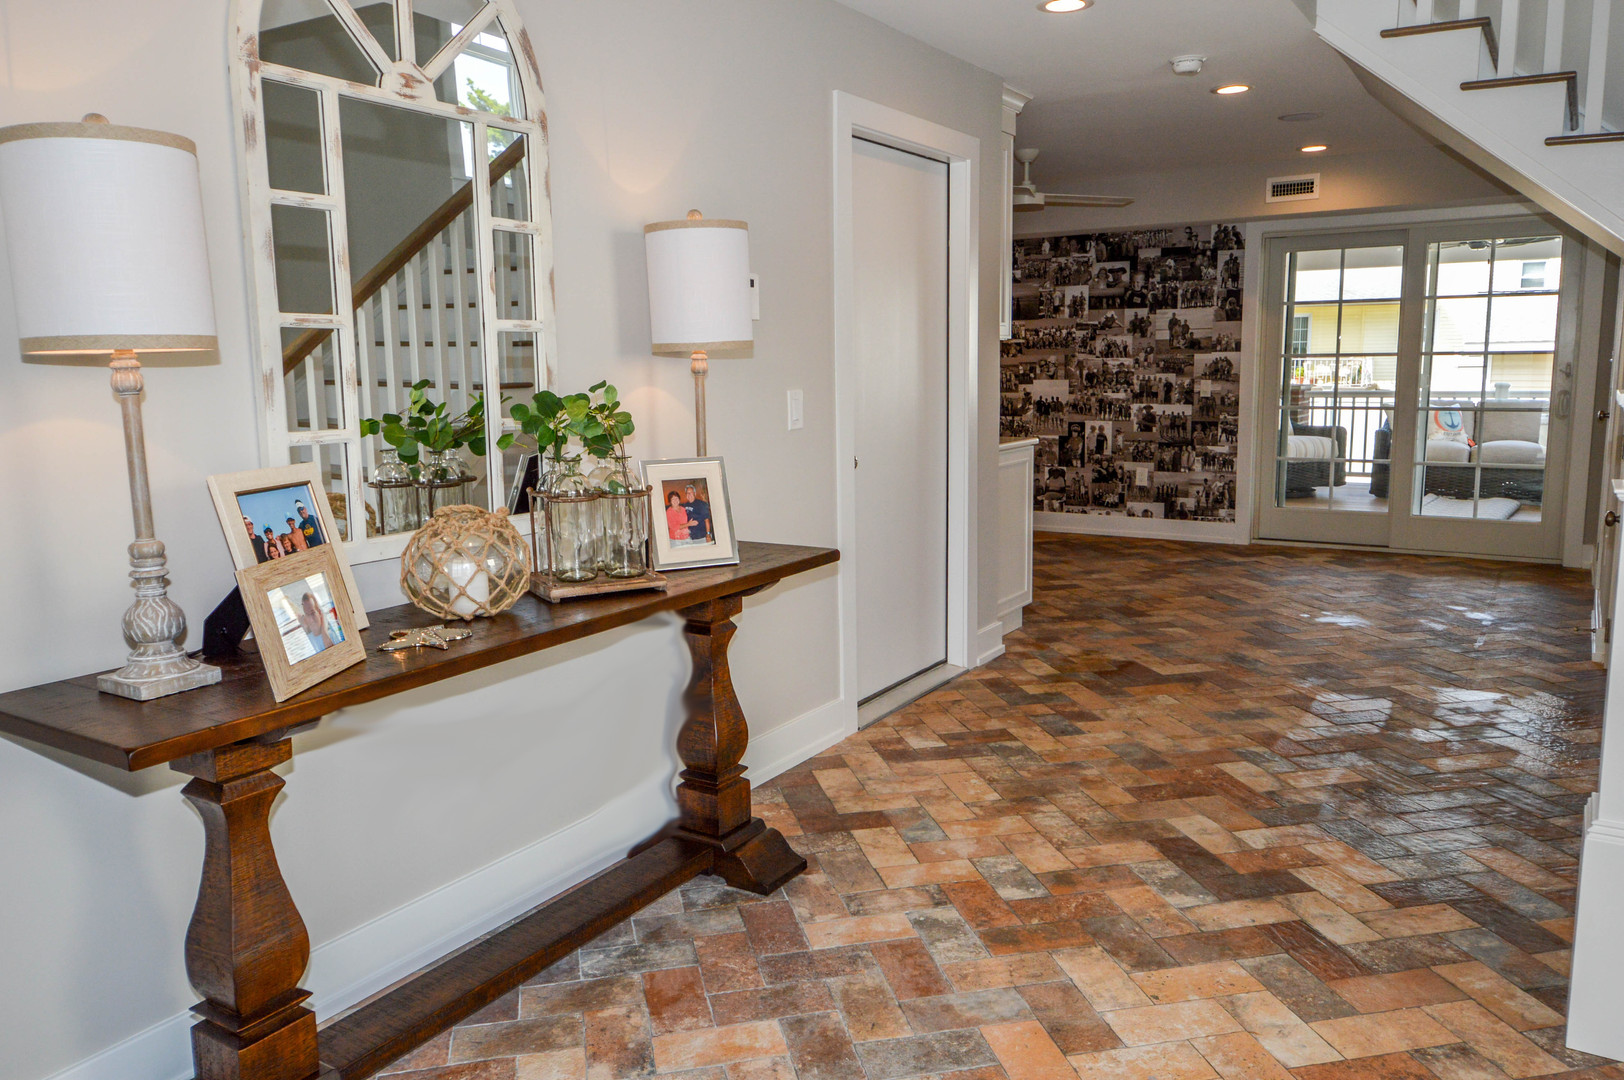 Bring the outside in with a herringbone brick style ceramic tile floor.   North Wildwood, NJ